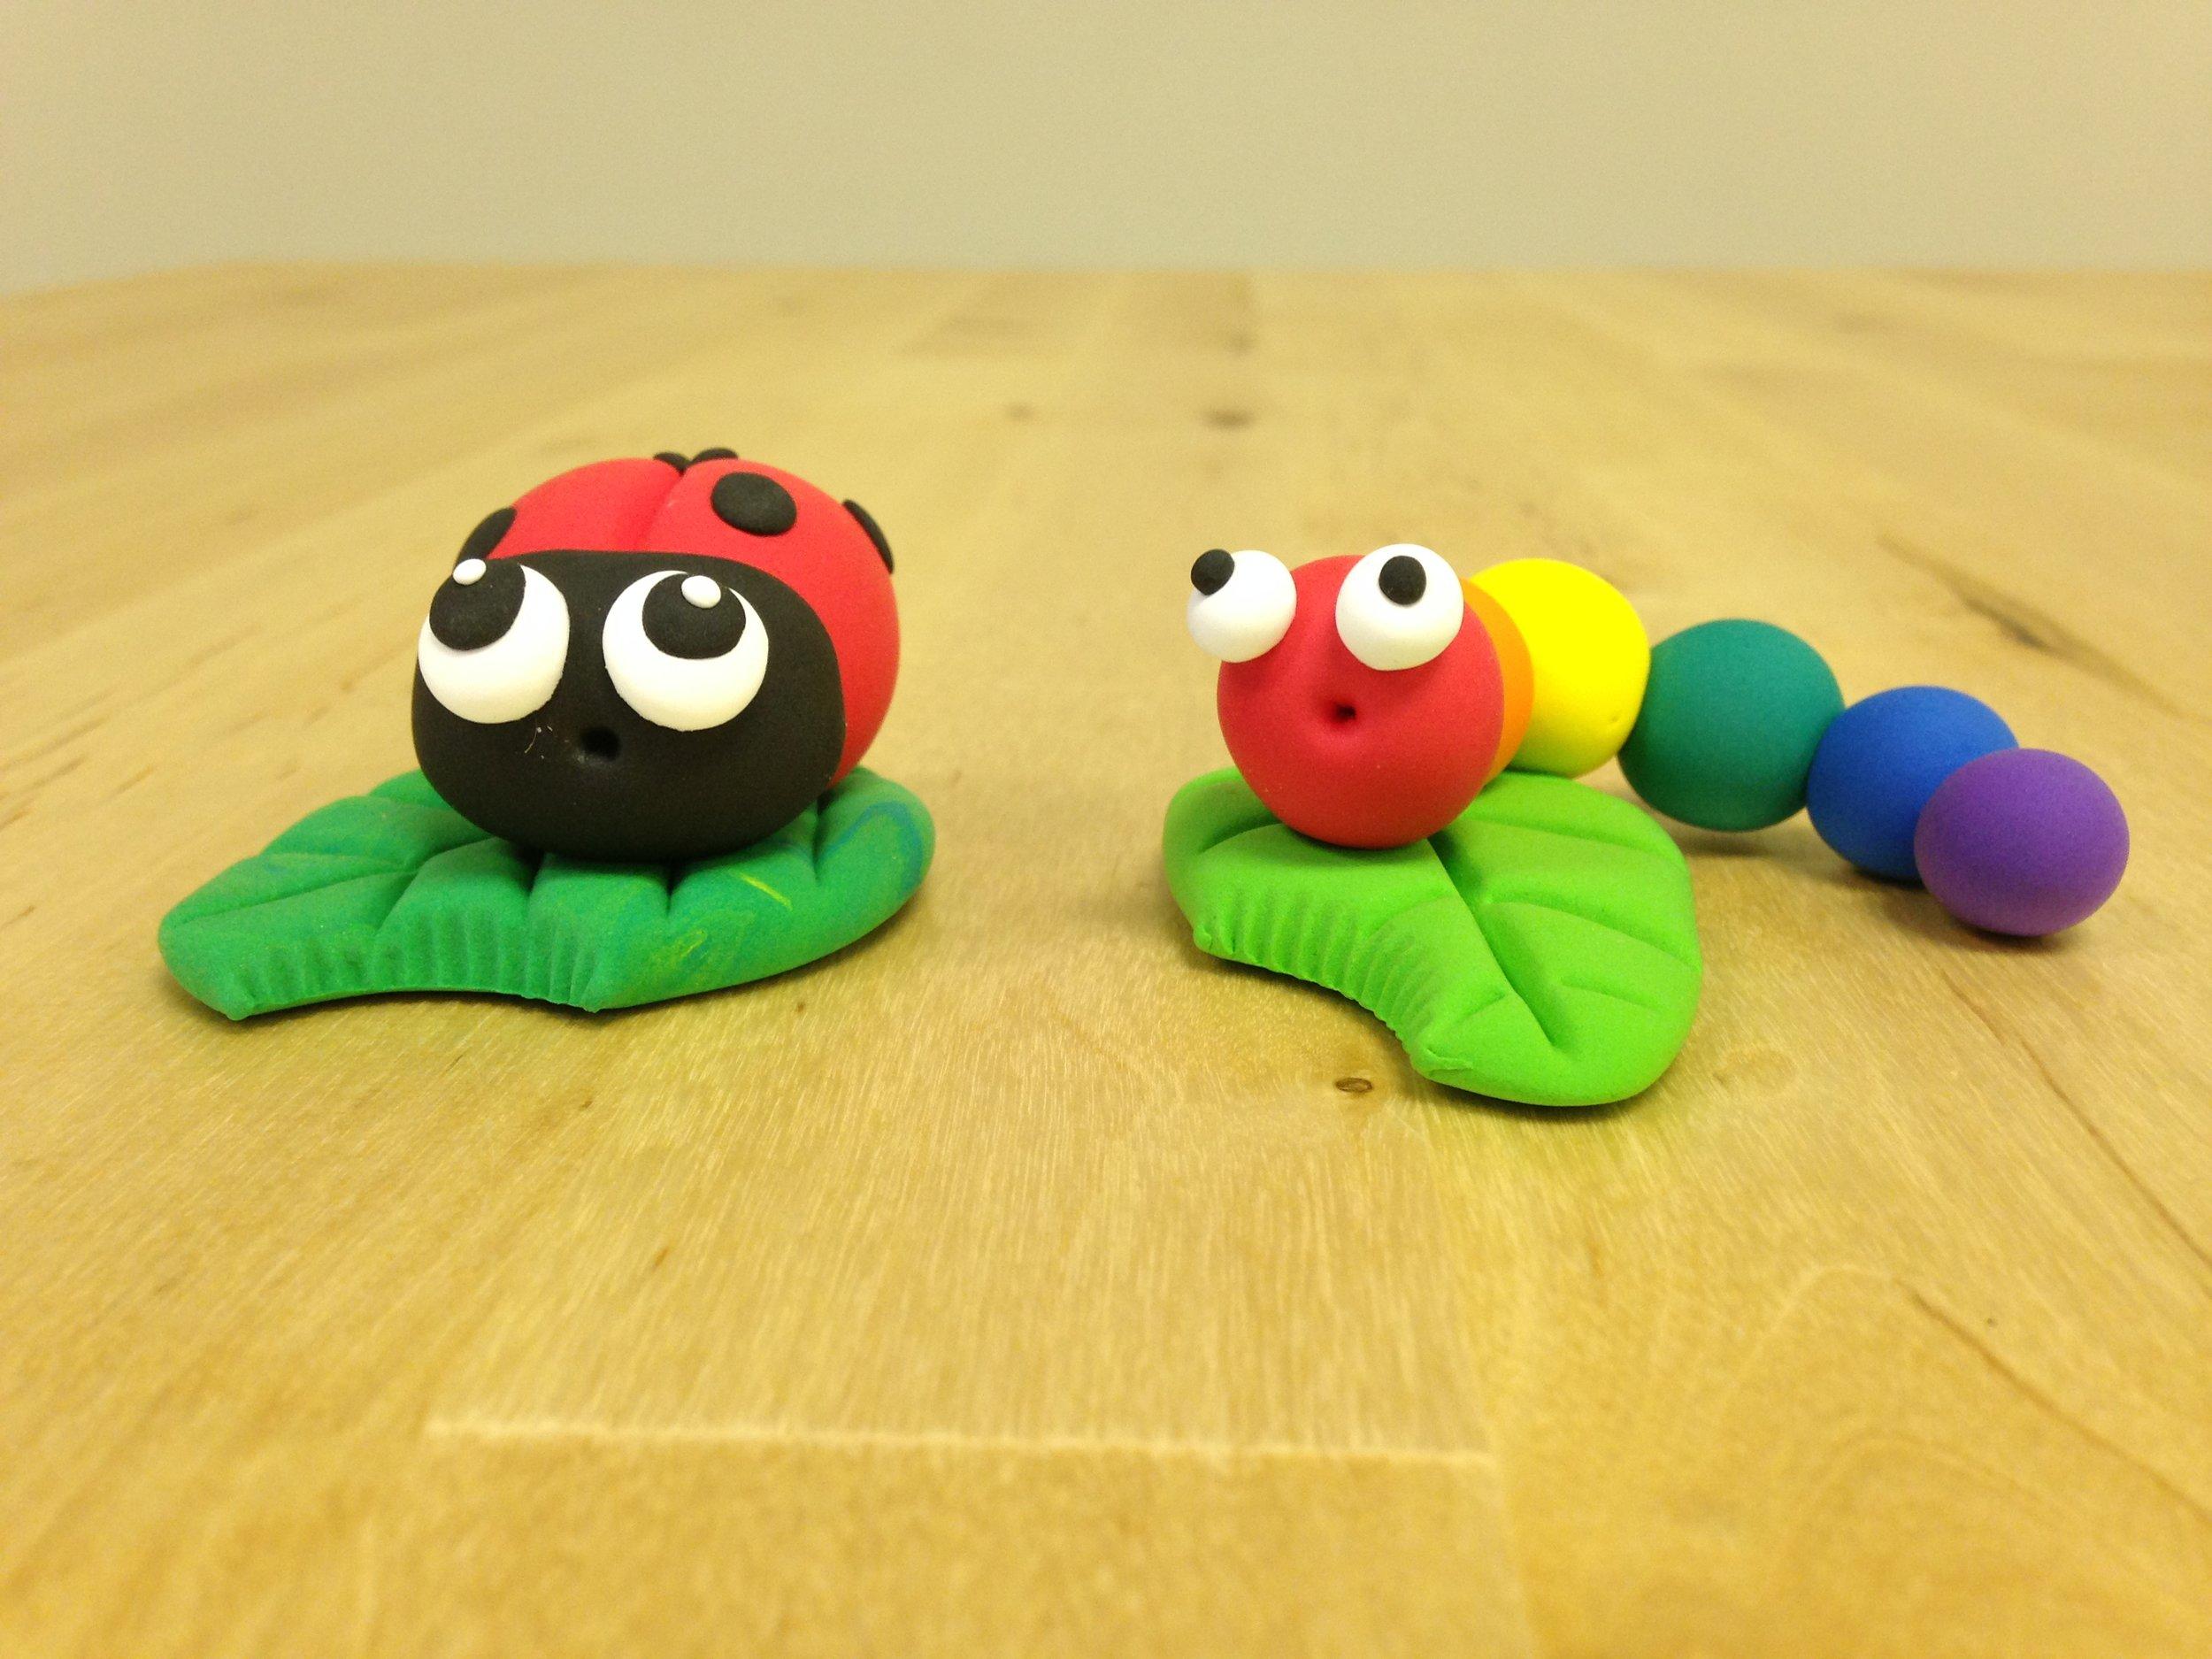 ladybug and caterpillar.JPG